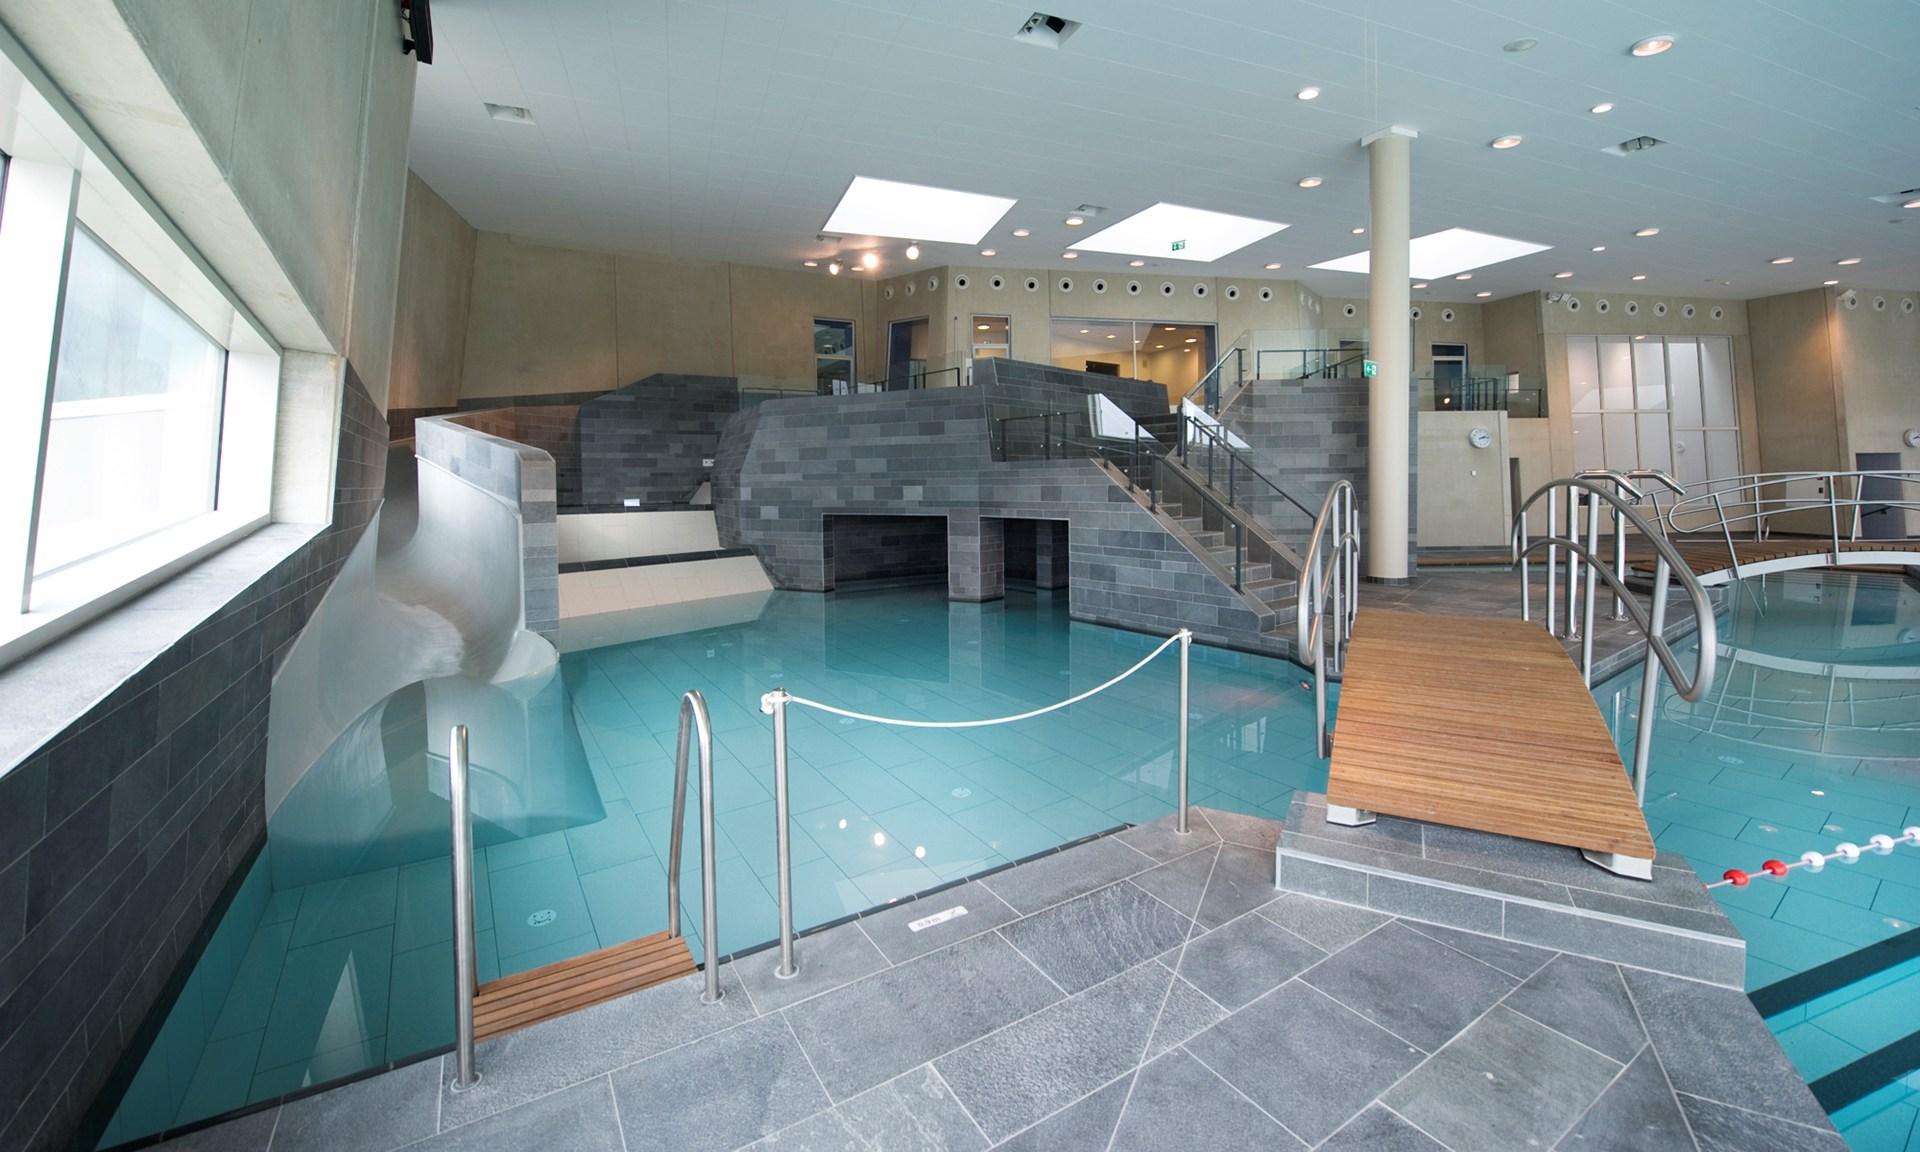 valby kulturhus svømmehal